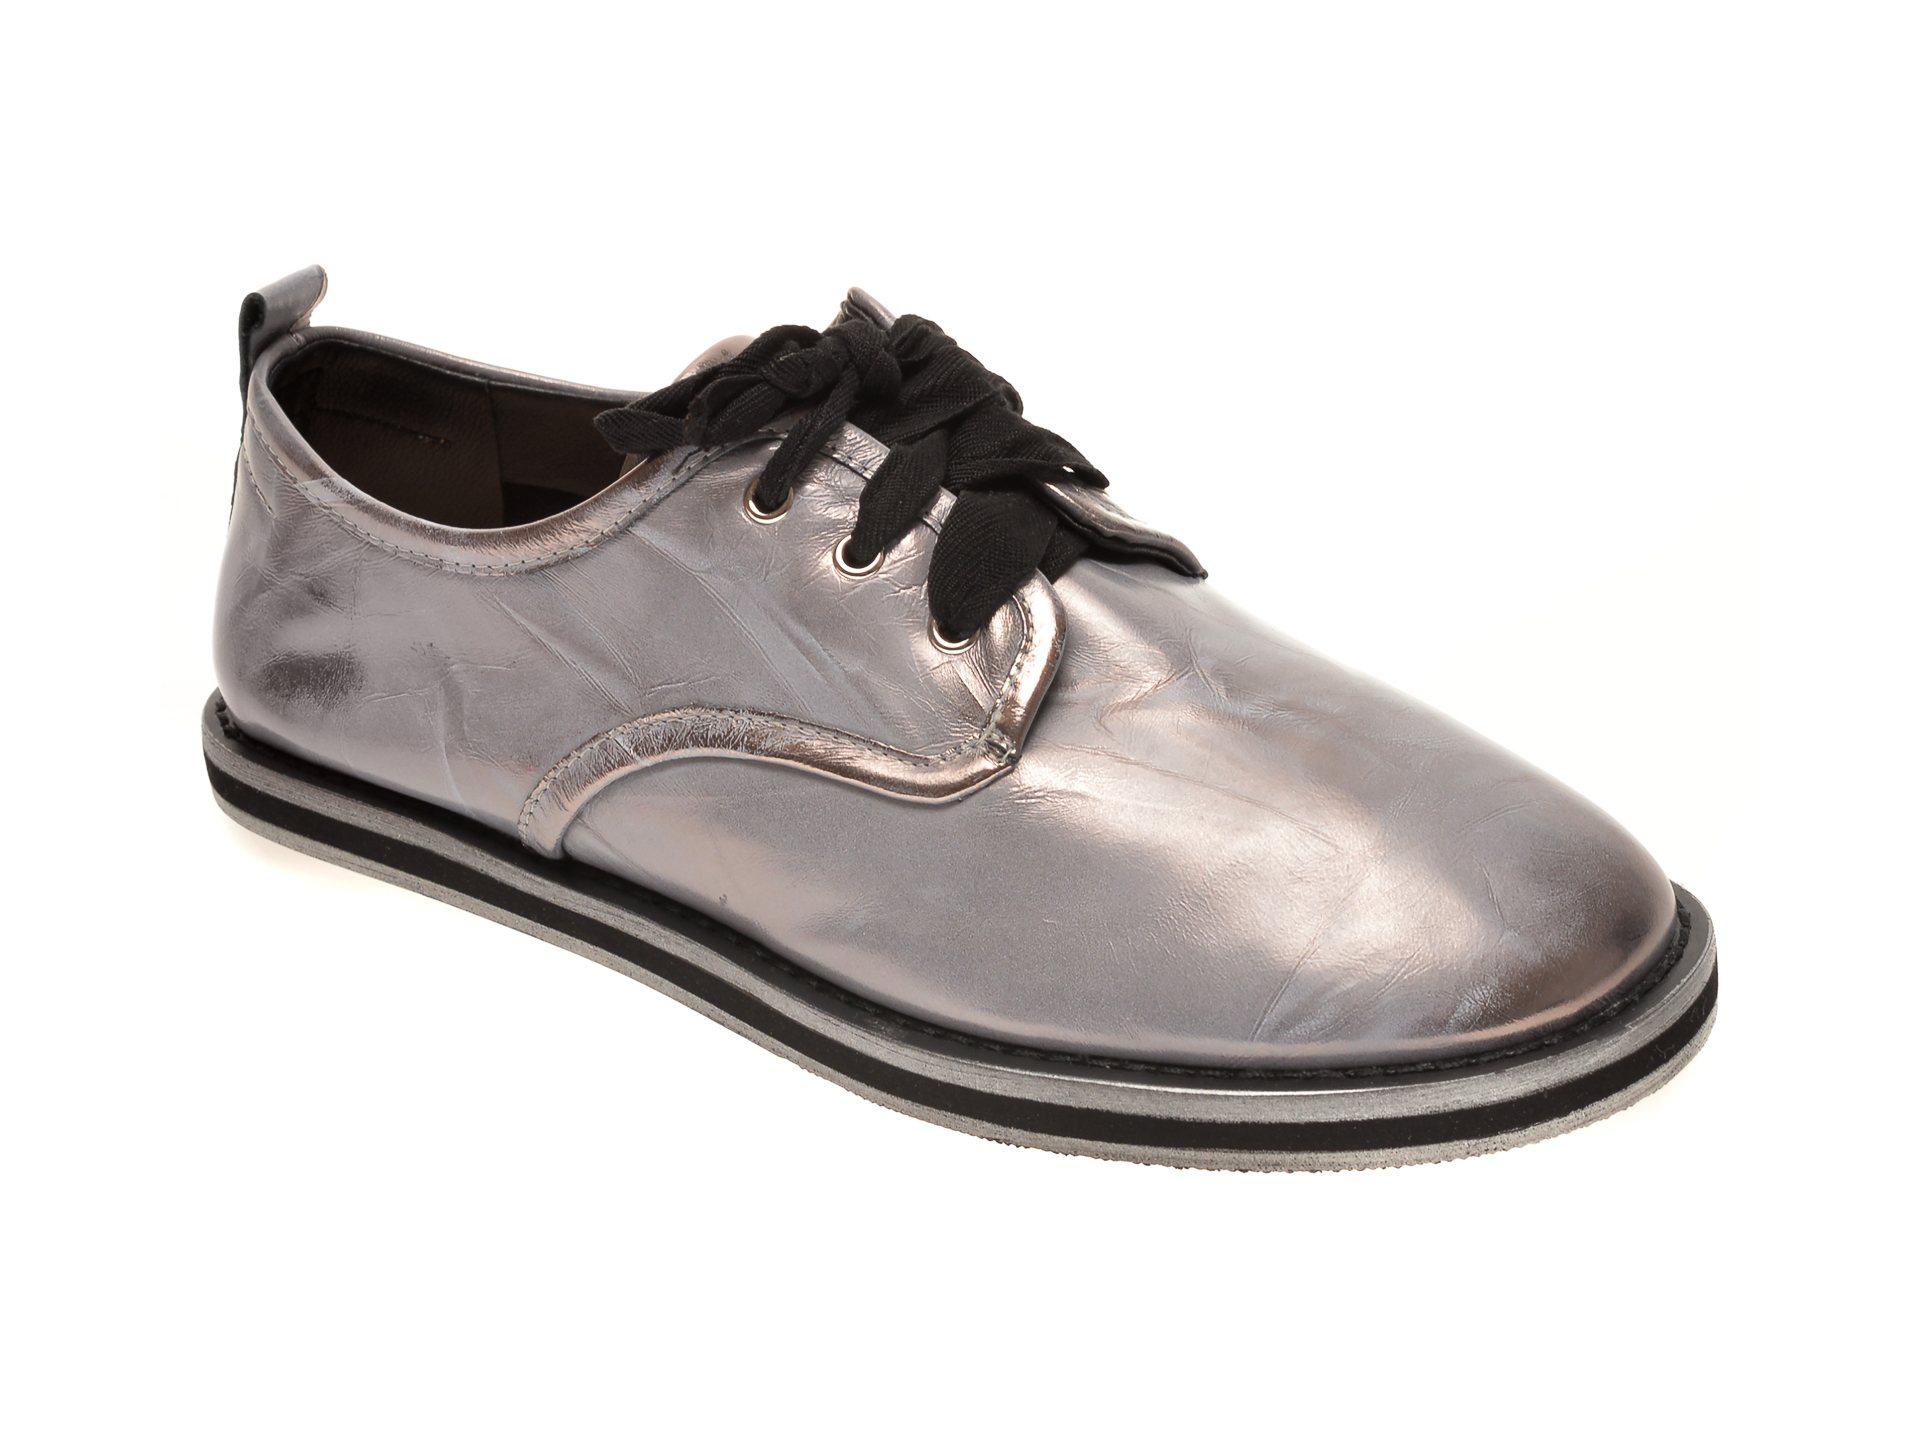 Pantofi Epica Gri, Ah025m1, Din Piele Naturala